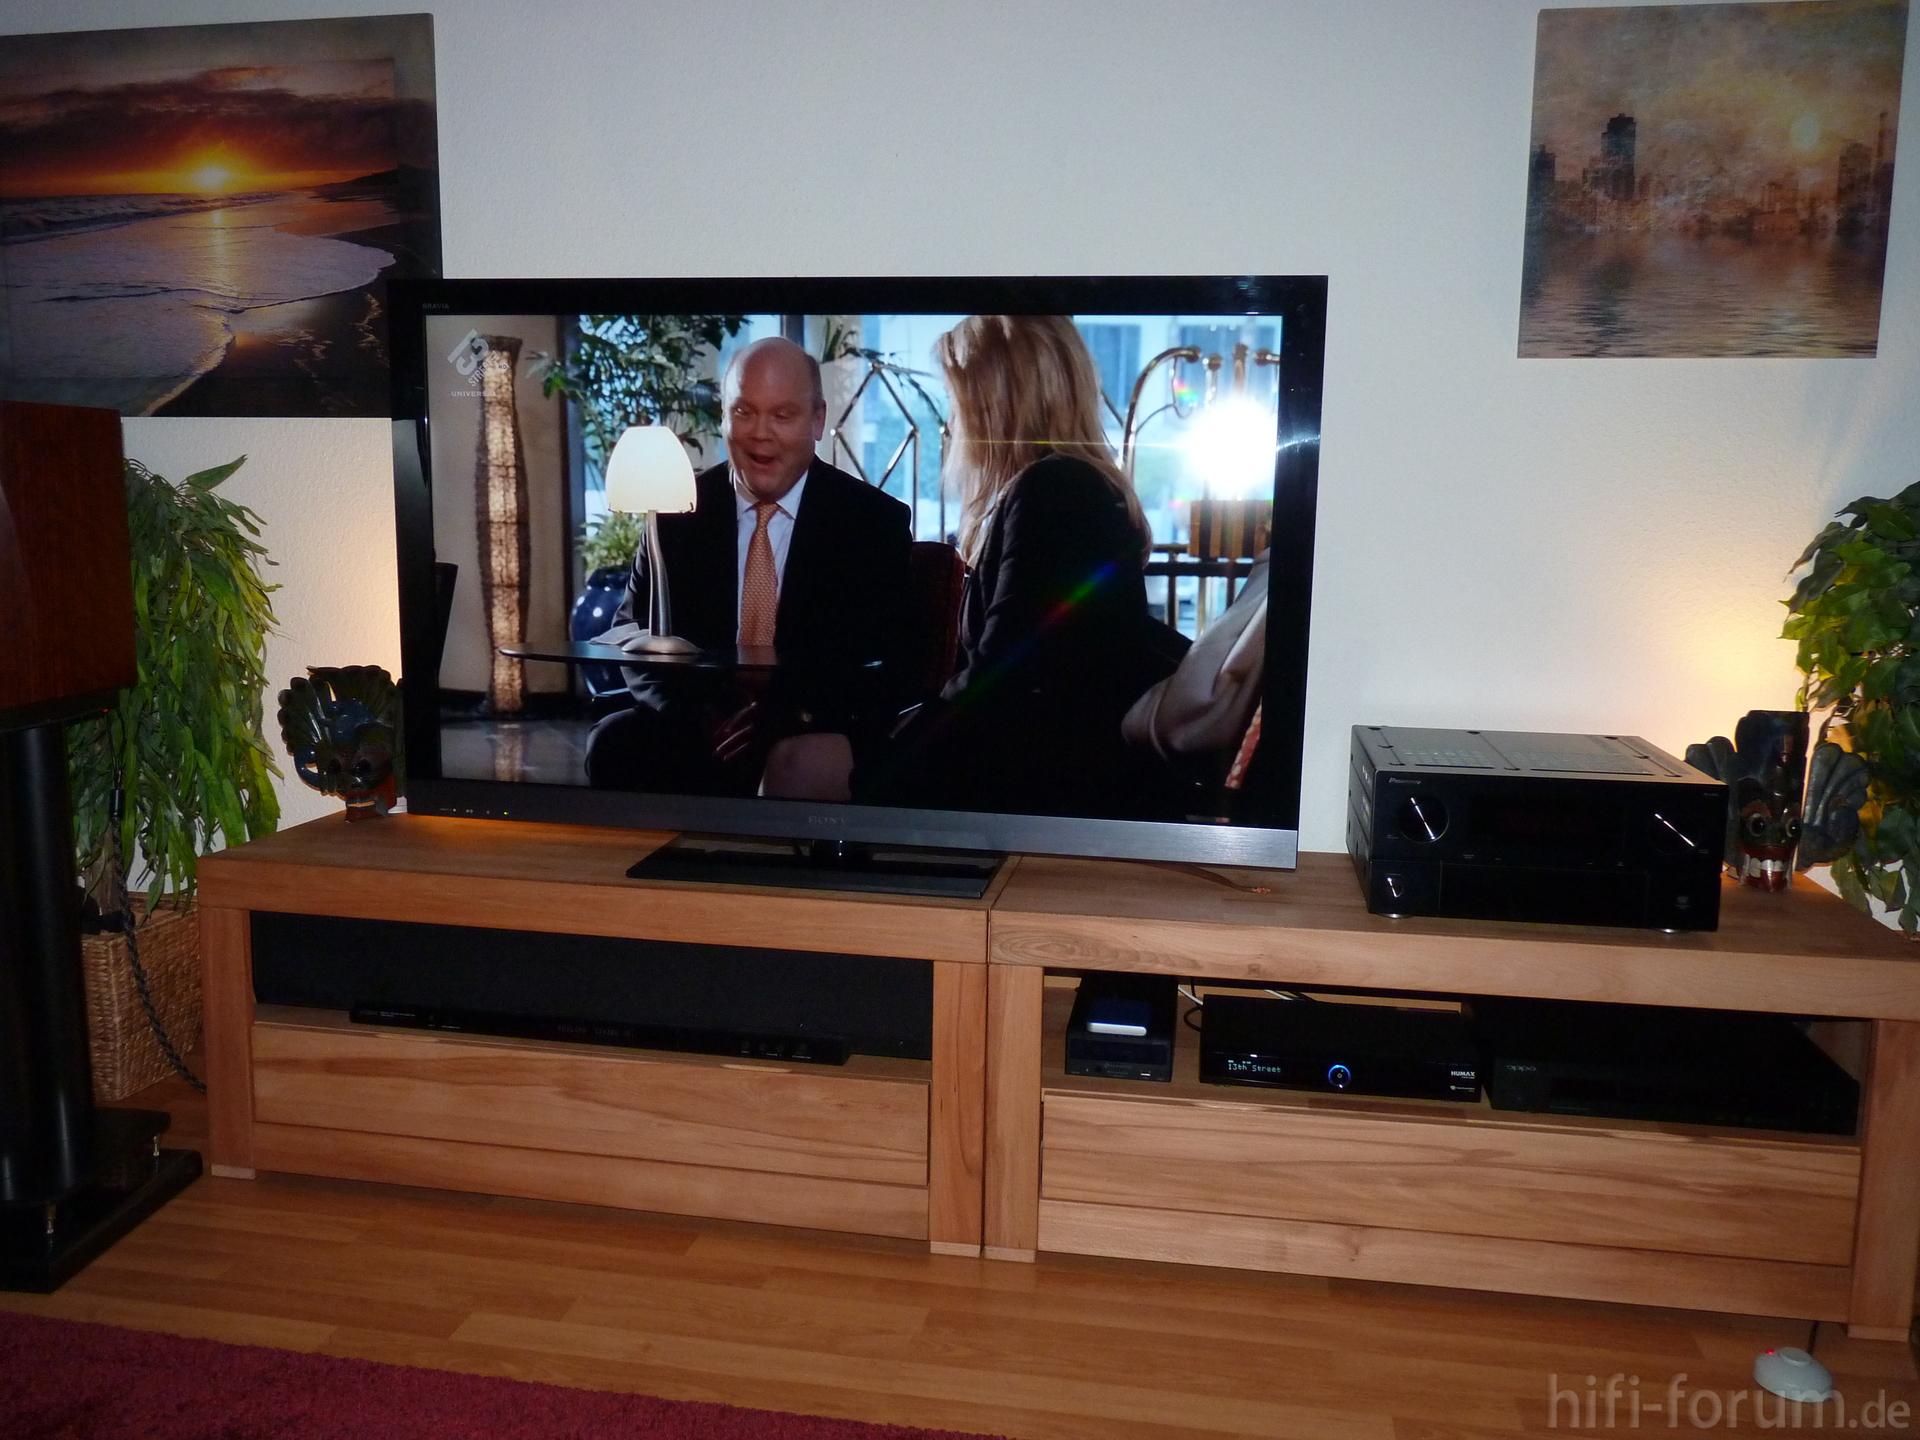 p1010698 hifi bildergalerie. Black Bedroom Furniture Sets. Home Design Ideas